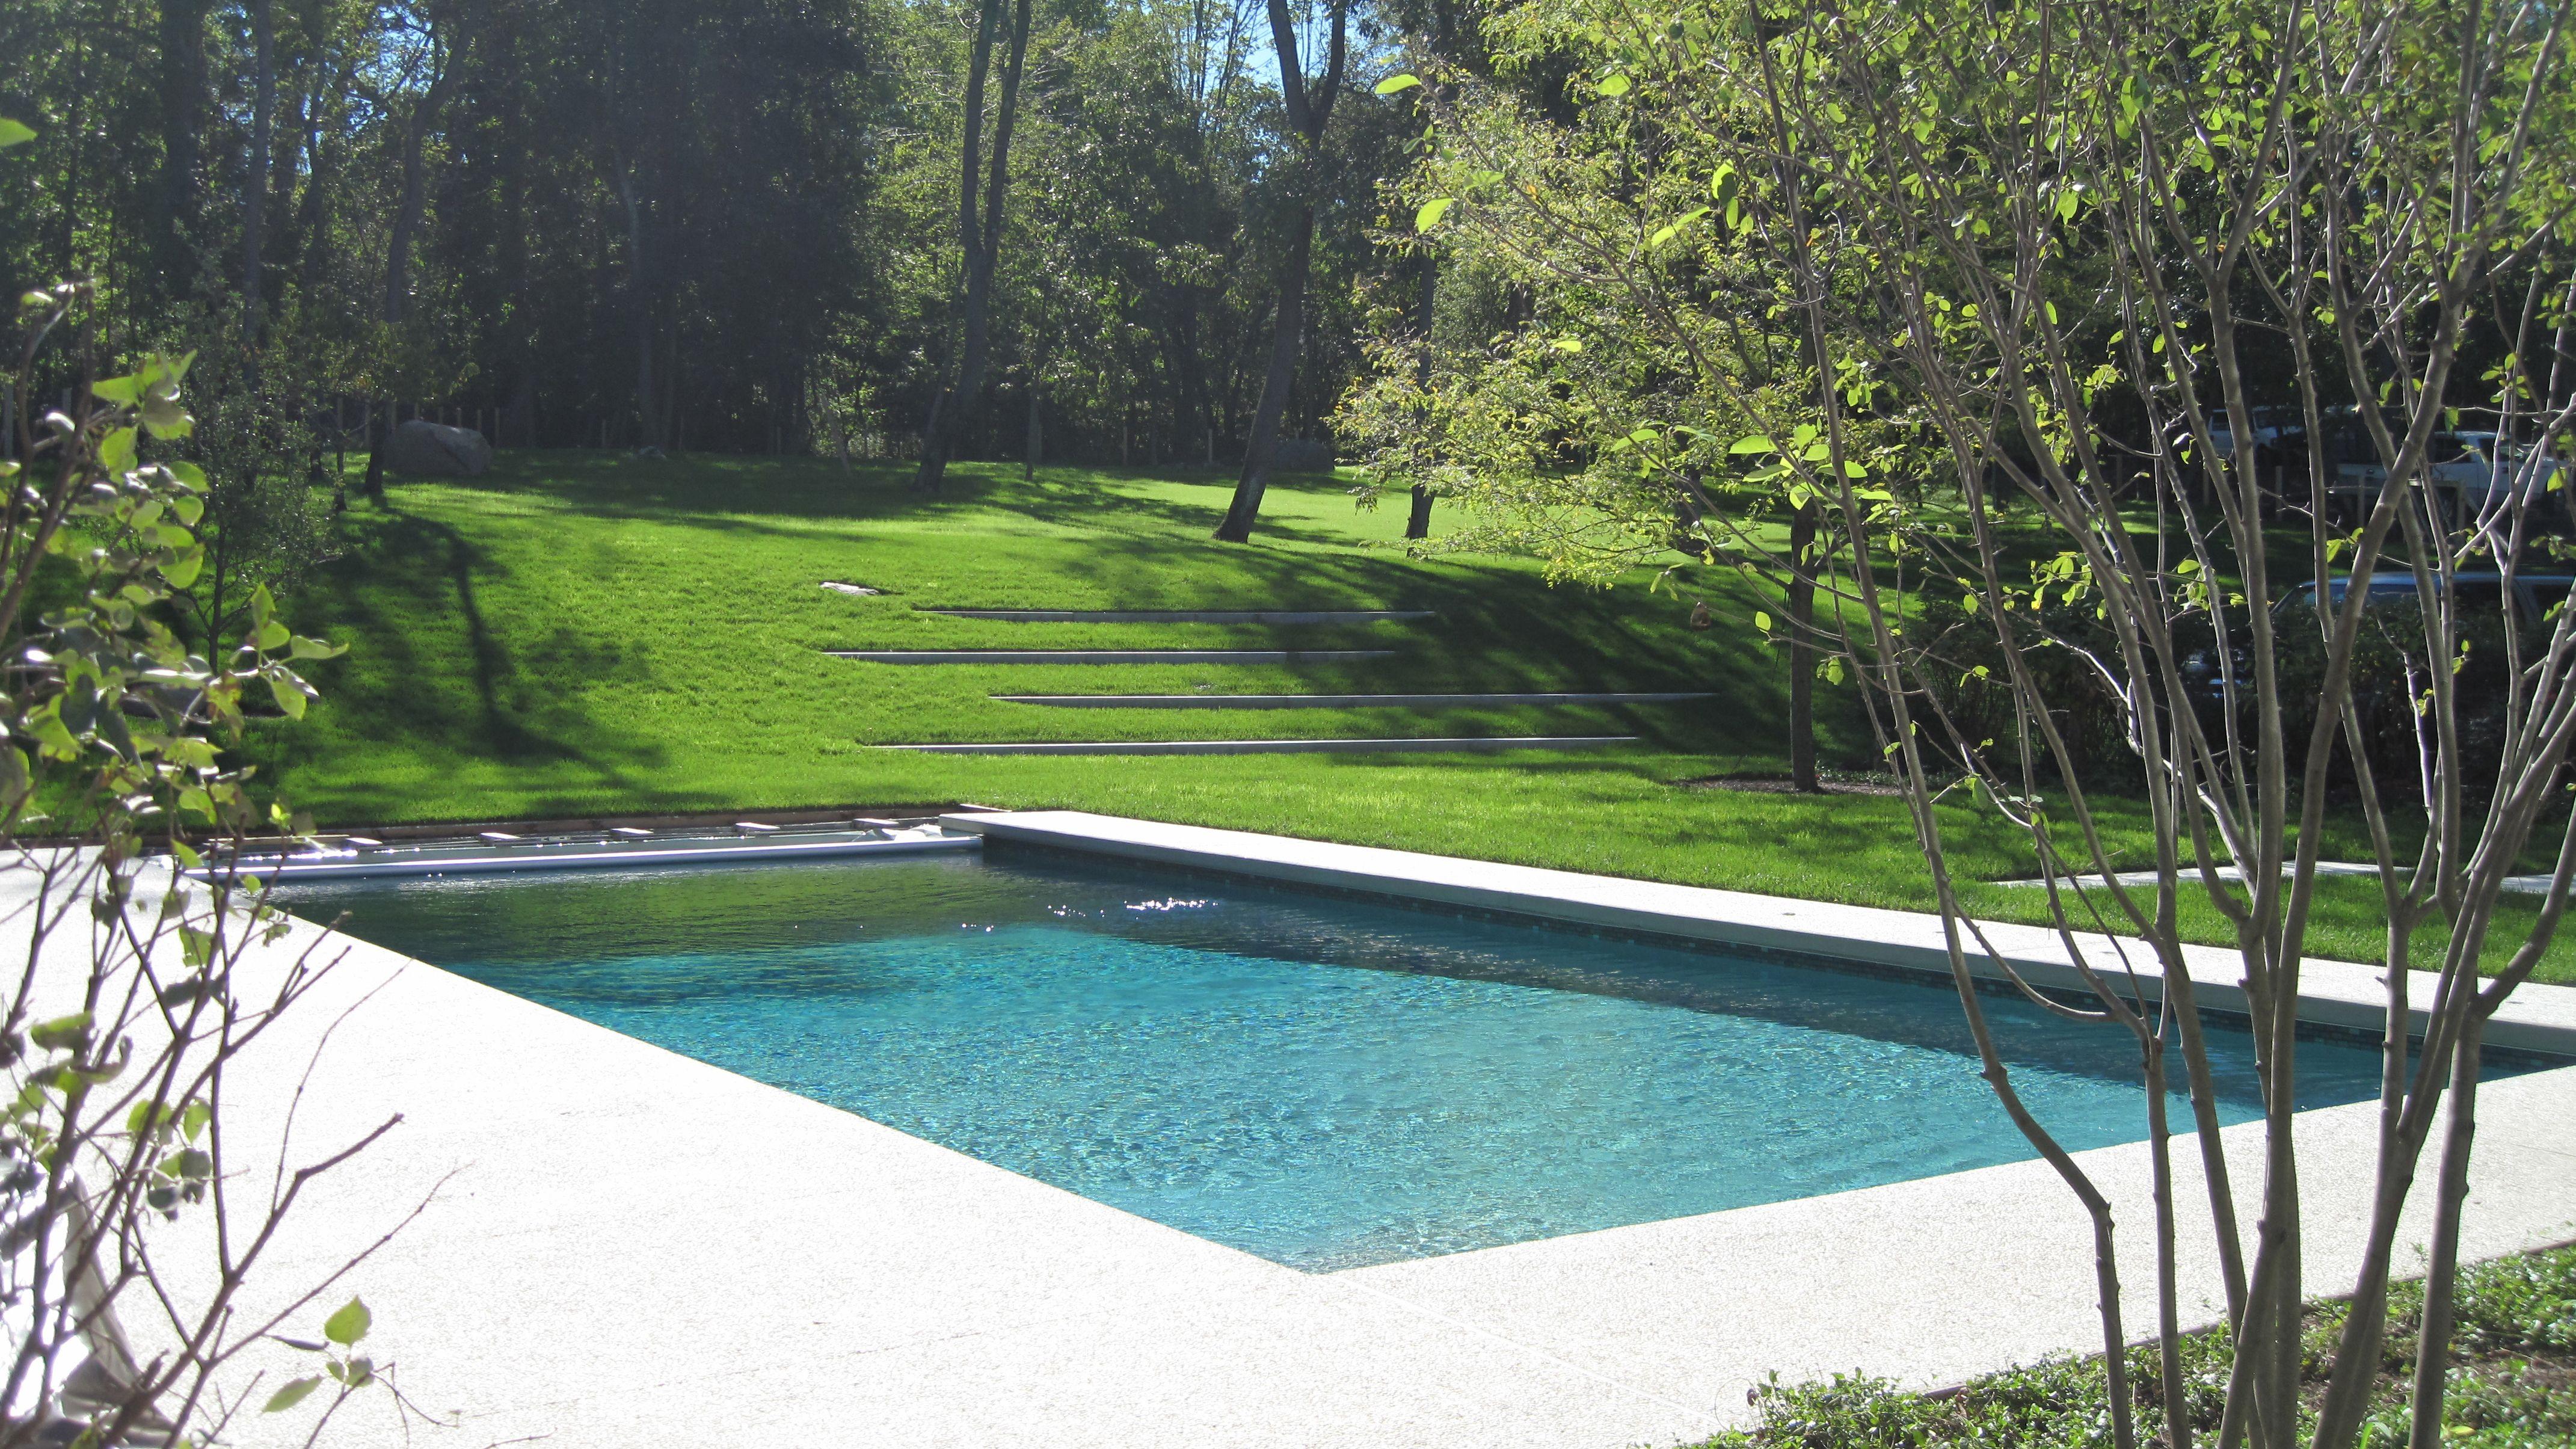 mcla new england massachusetts landscape architecture design